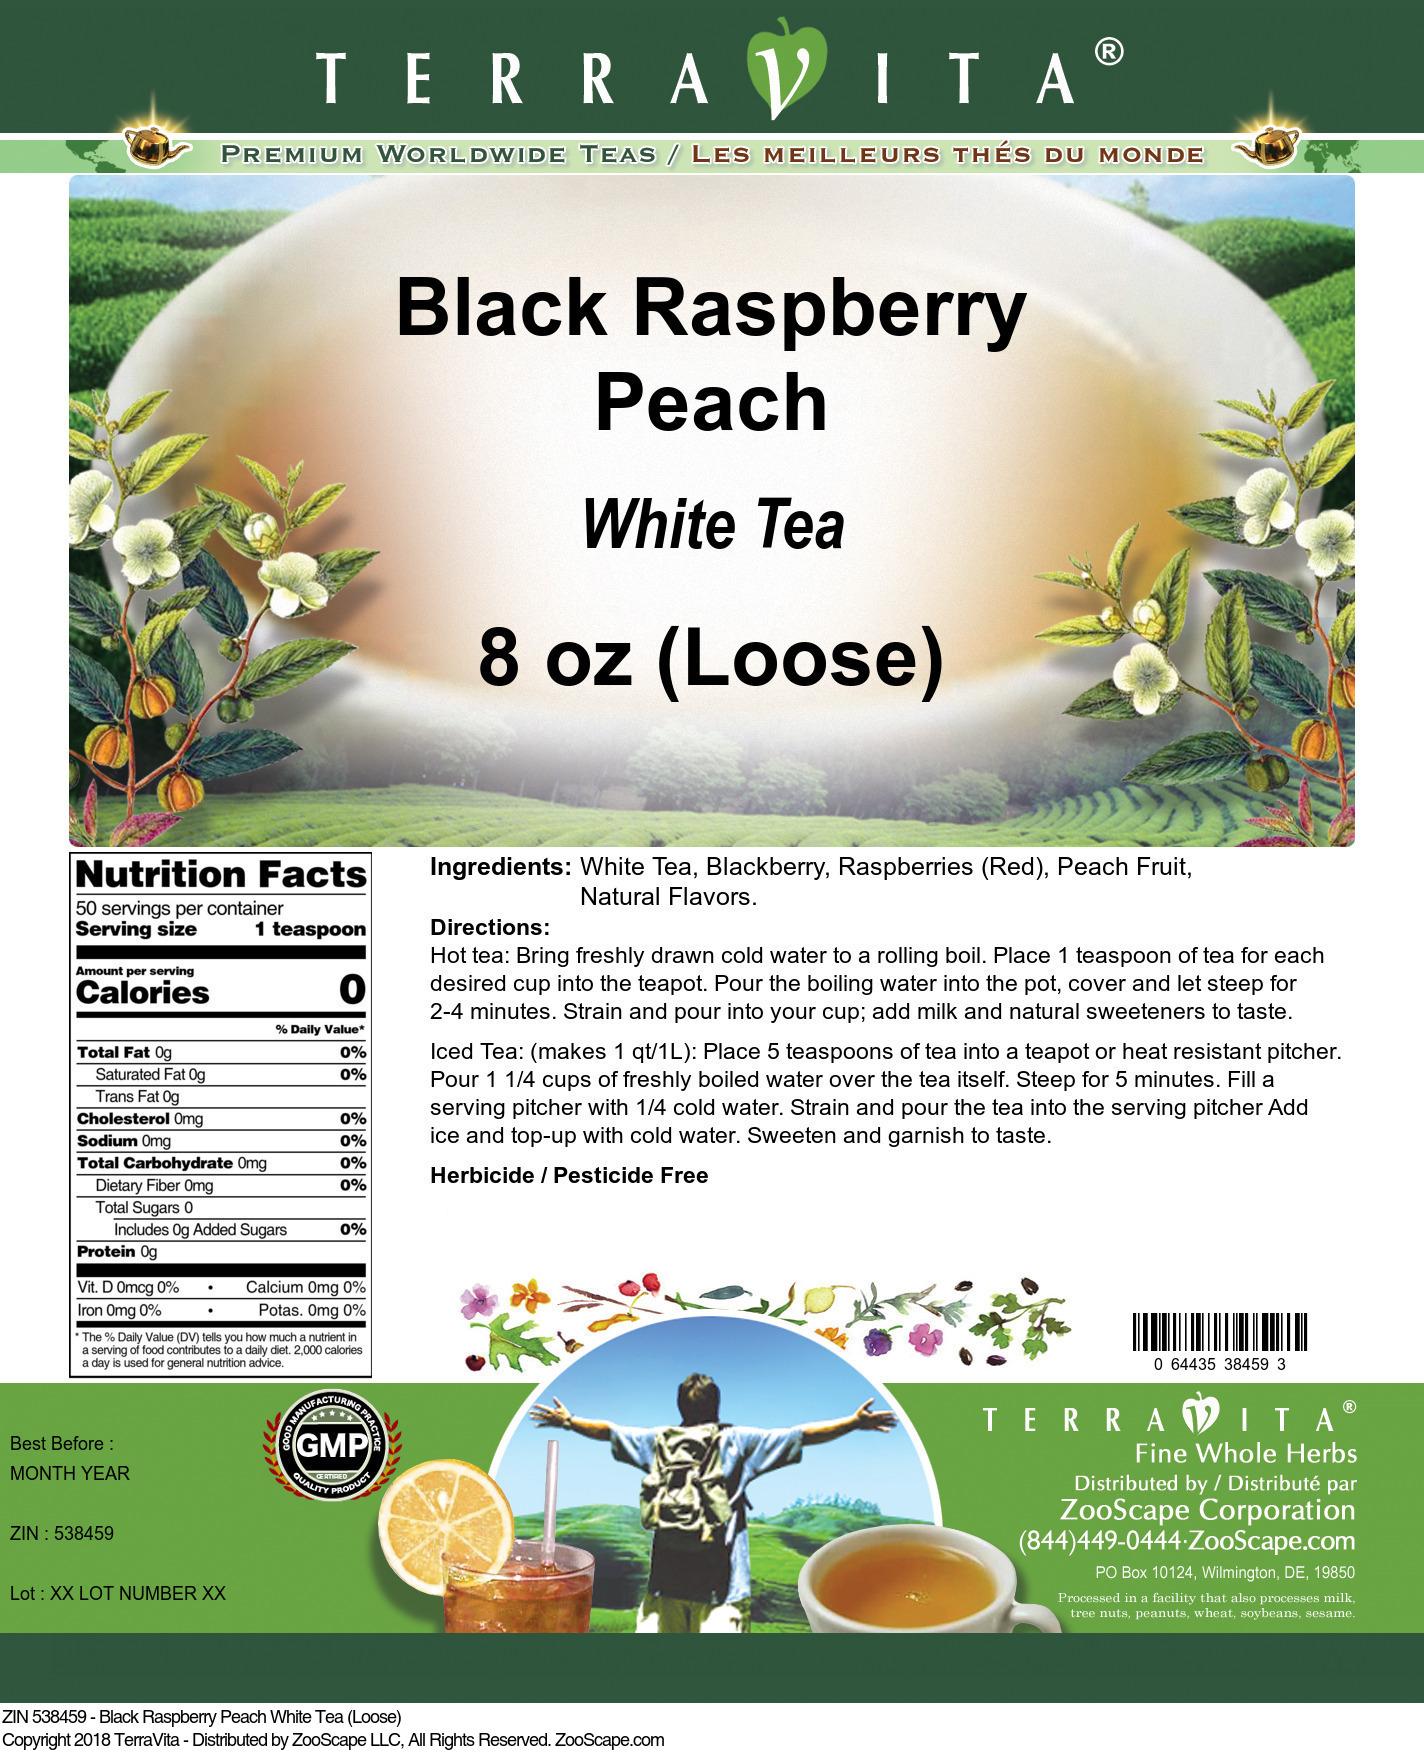 Black Raspberry Peach White Tea (Loose)